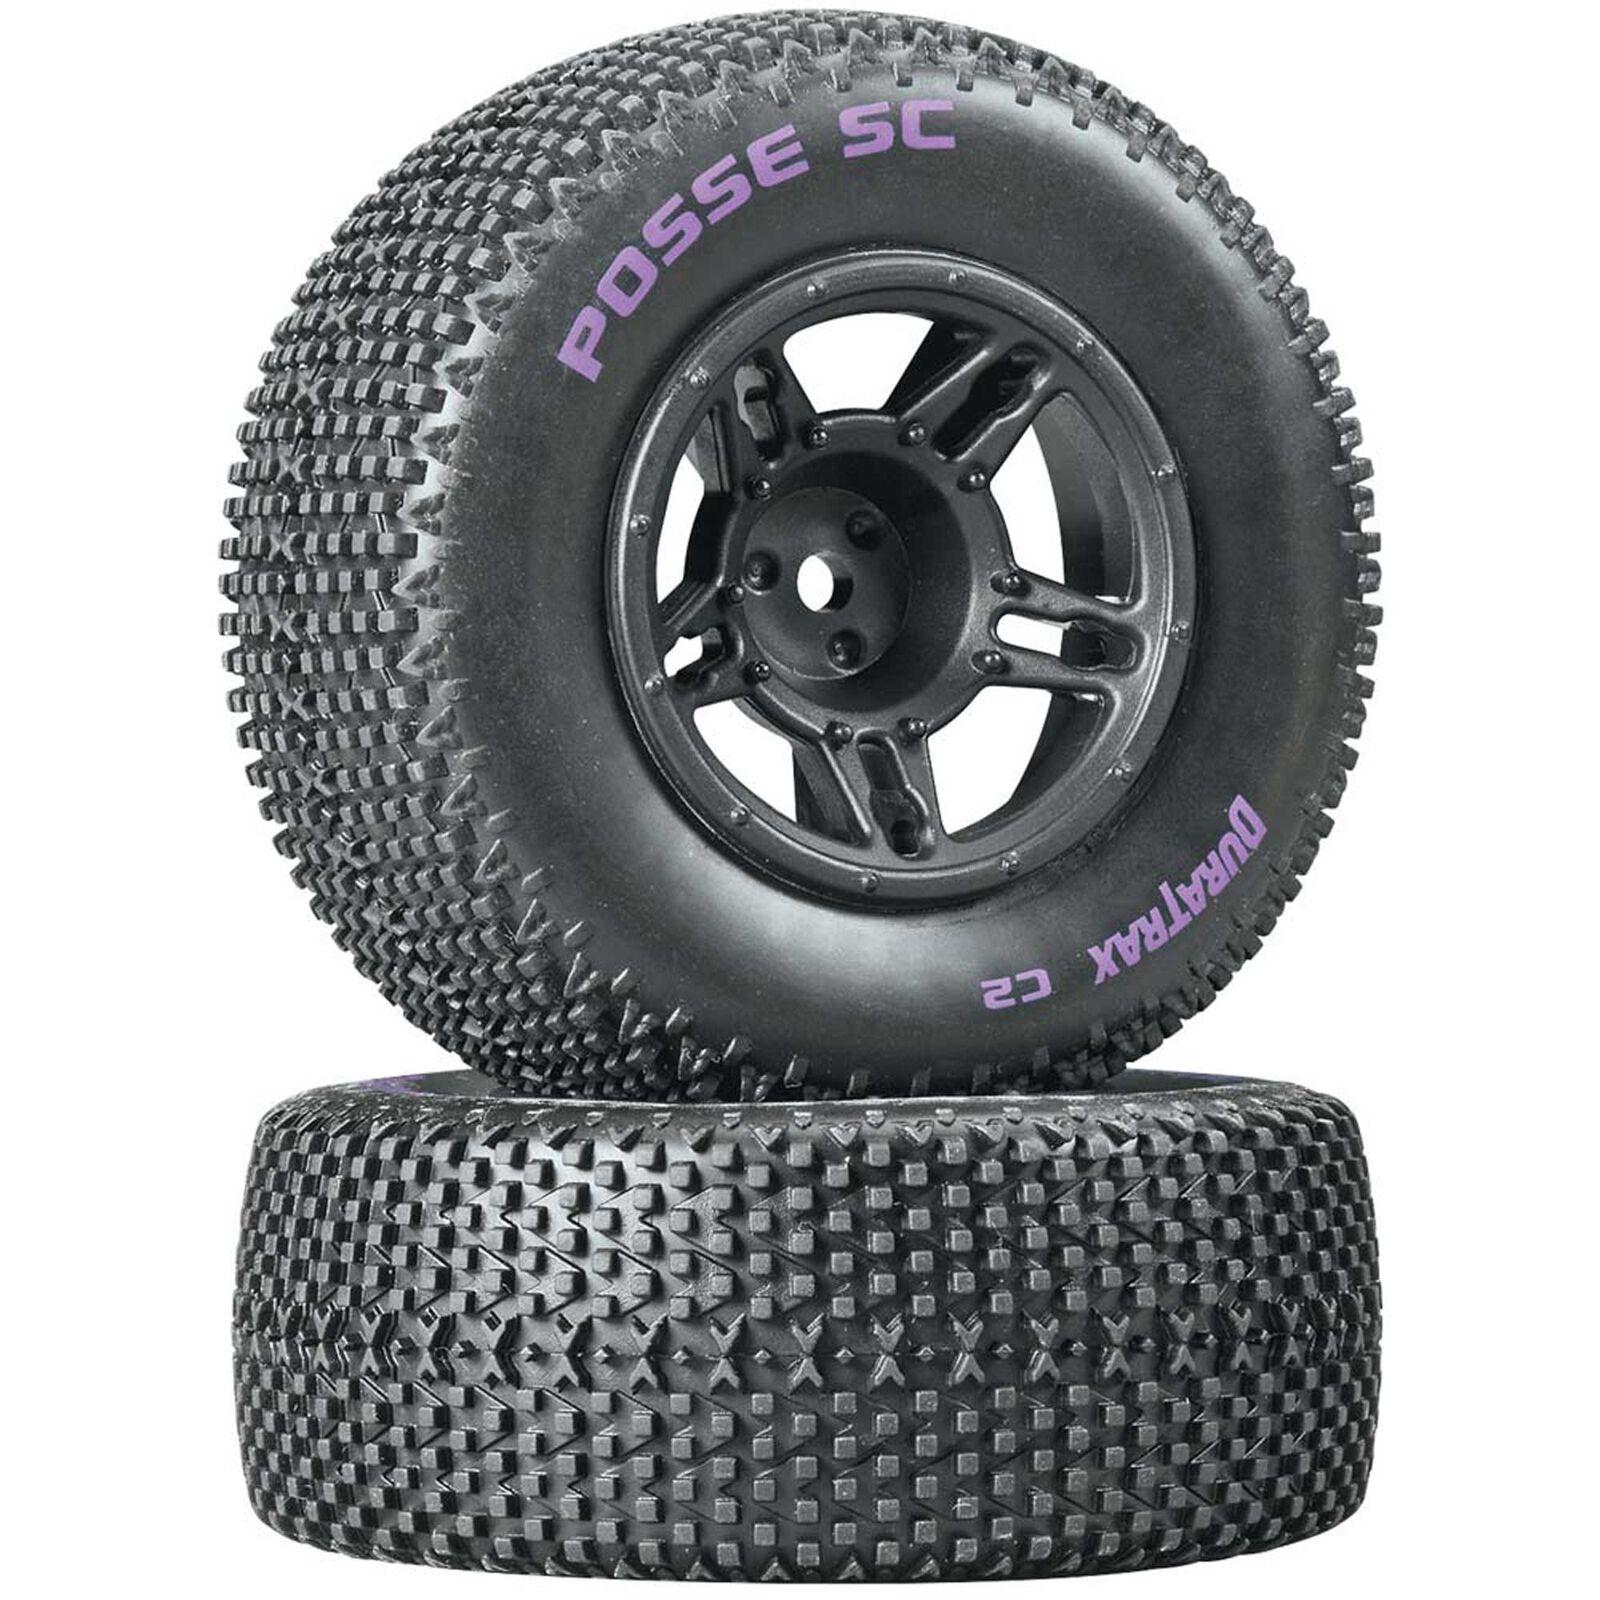 Posse SC C2 Mounted Tires, Front: Slash (2)